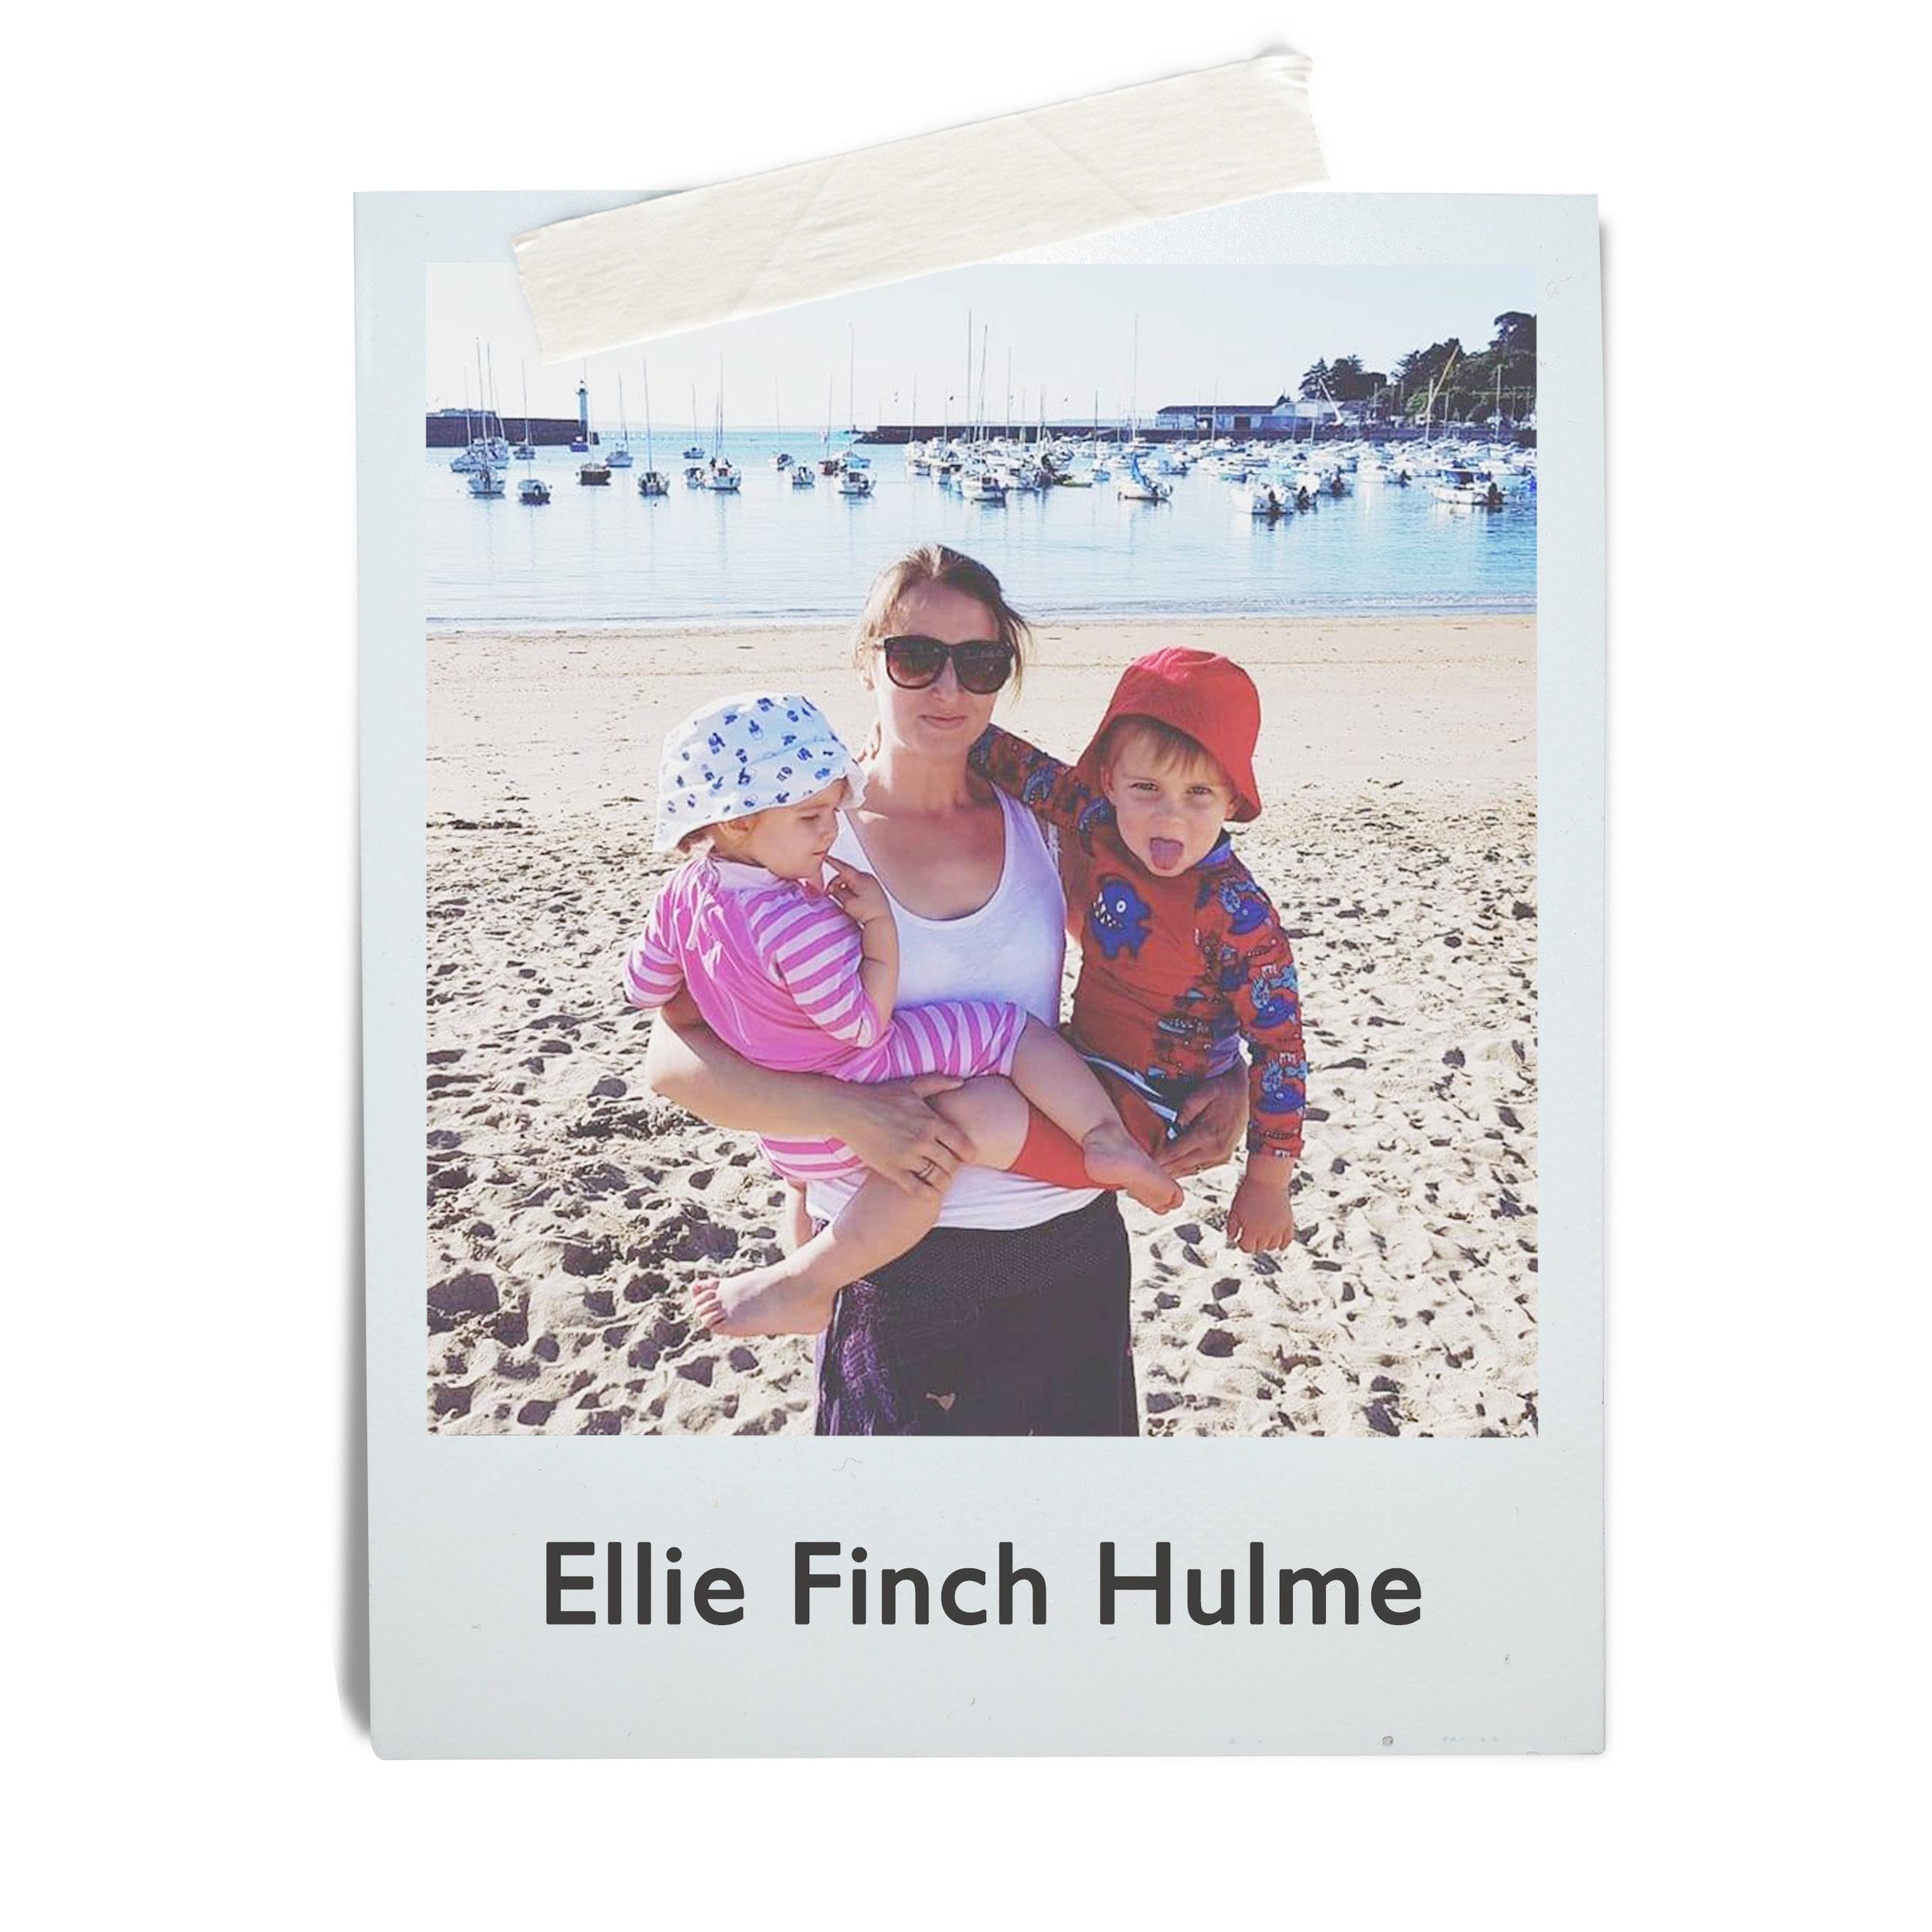 Ellie Finch Hulme